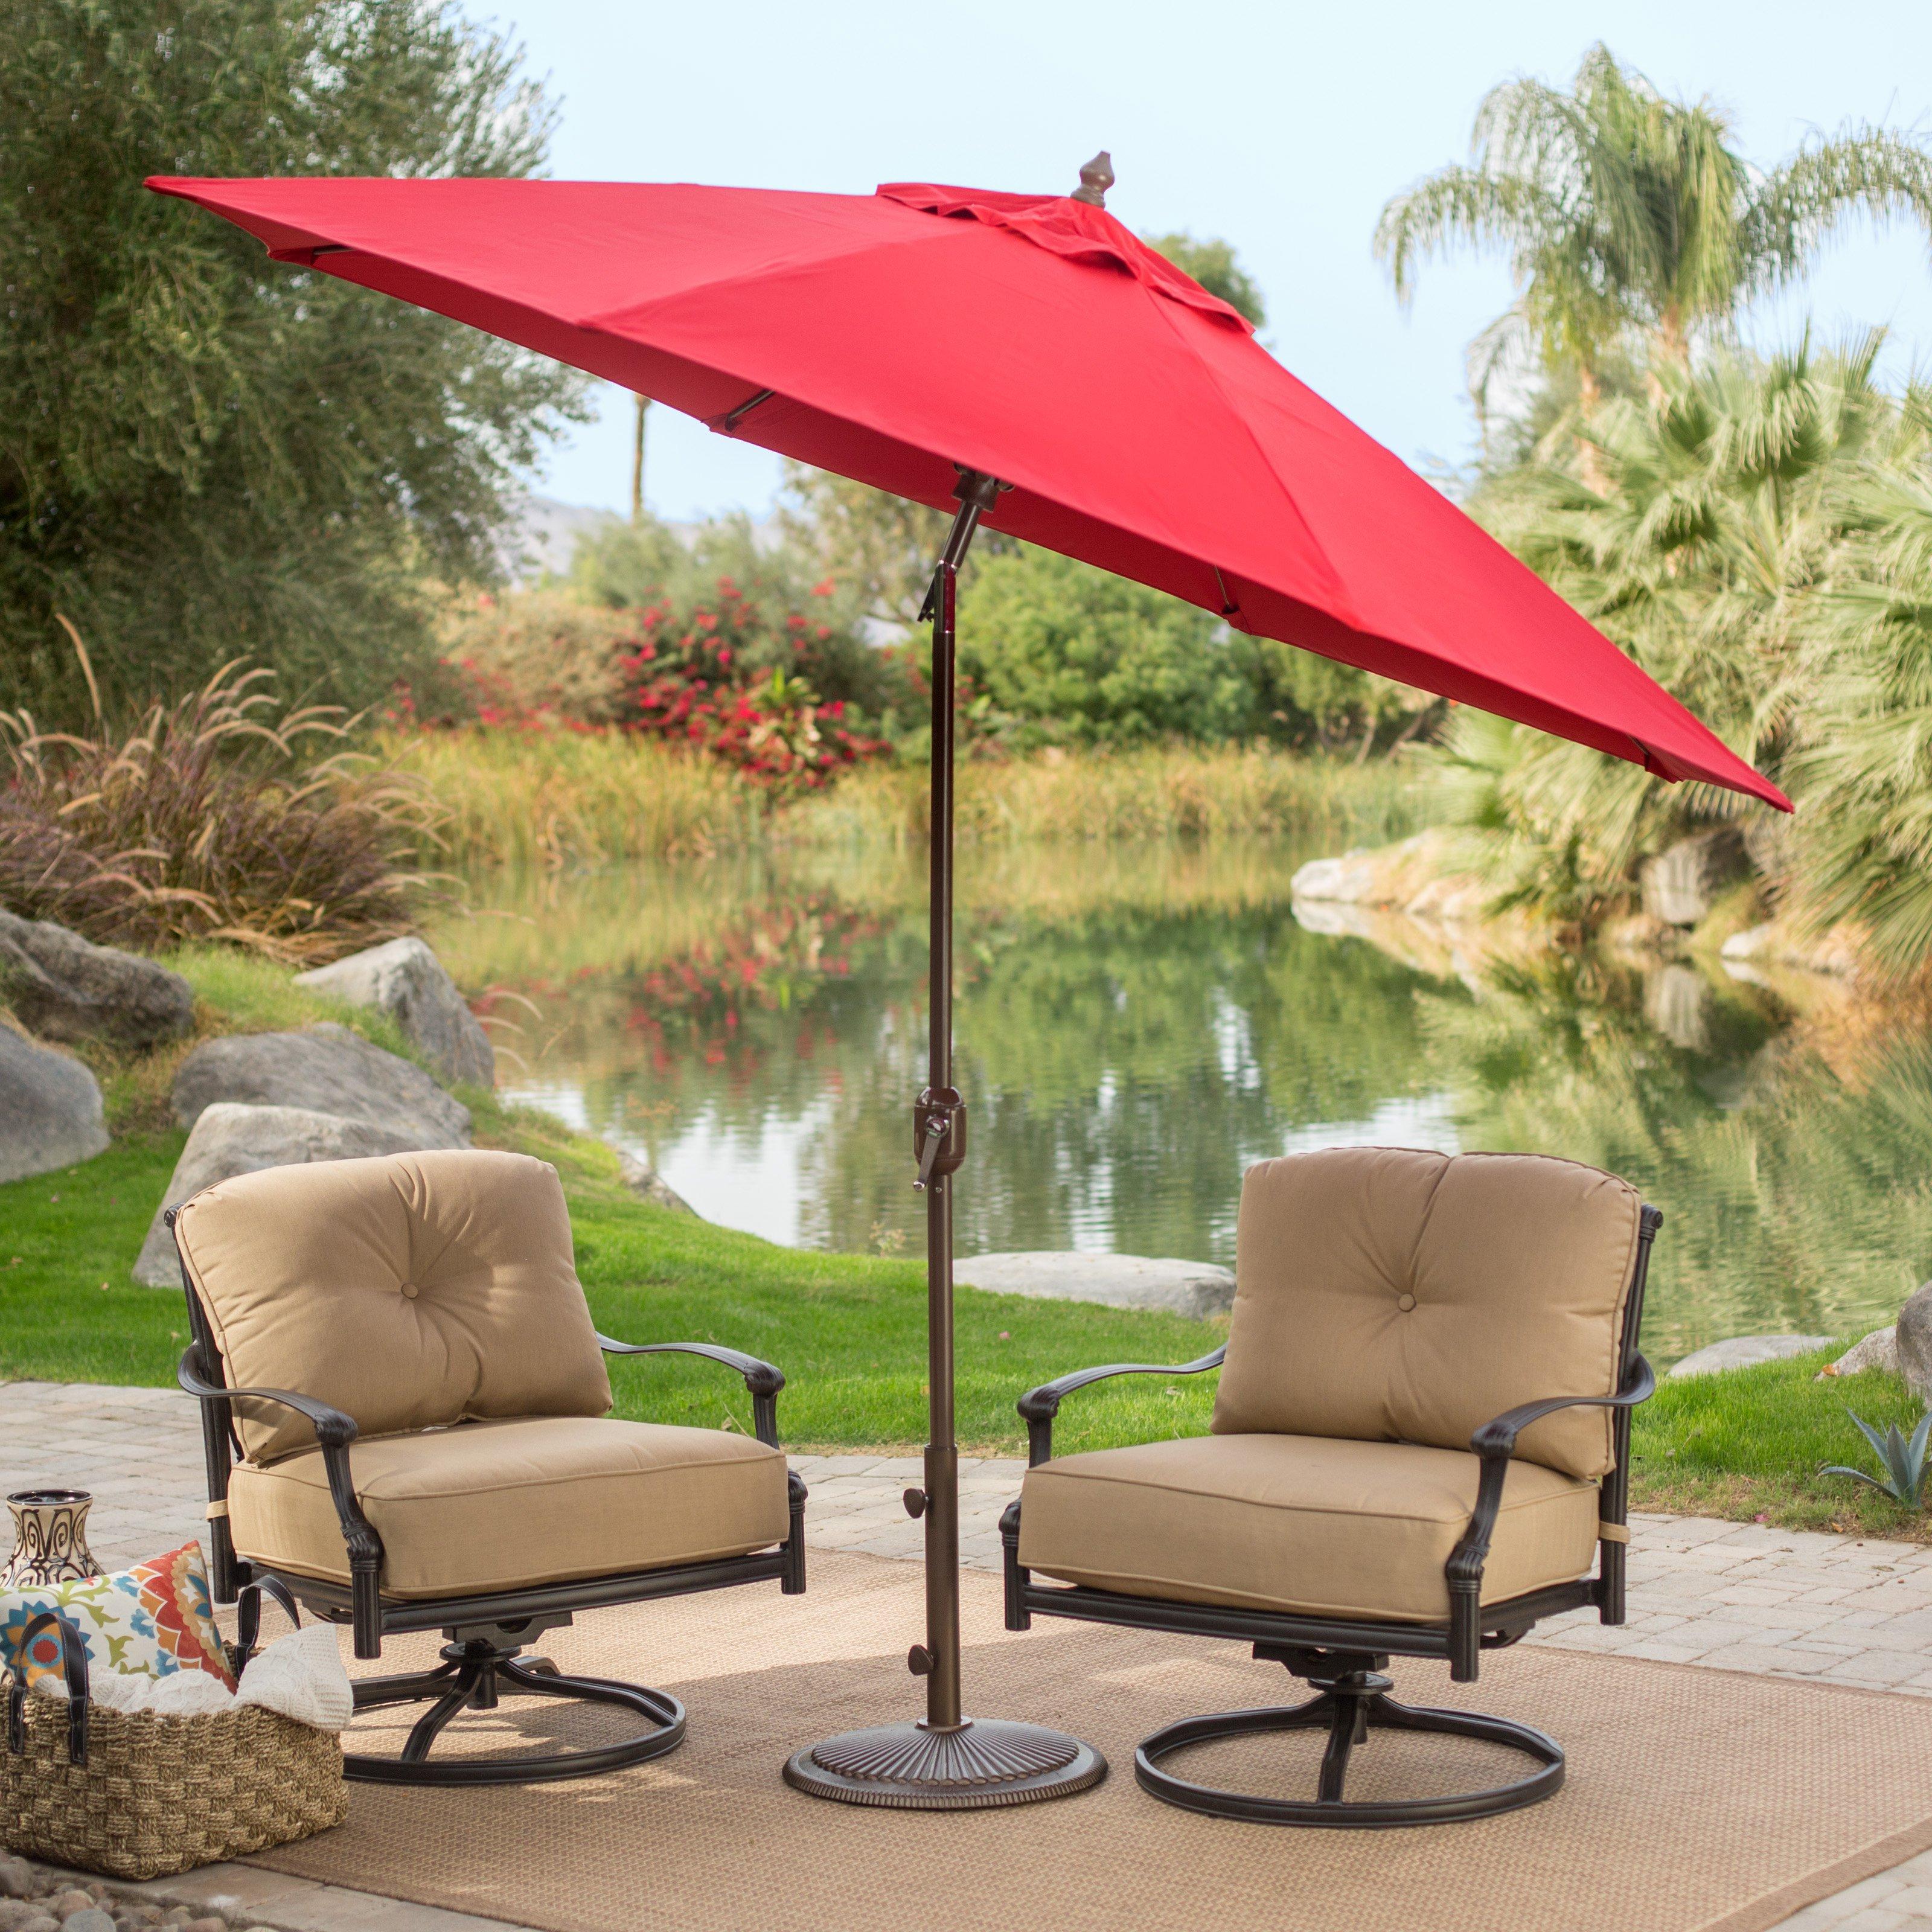 patio umbrellas sunbrella deluxe tilt aluminum patio umbrella - walmart.com IPQNXQB